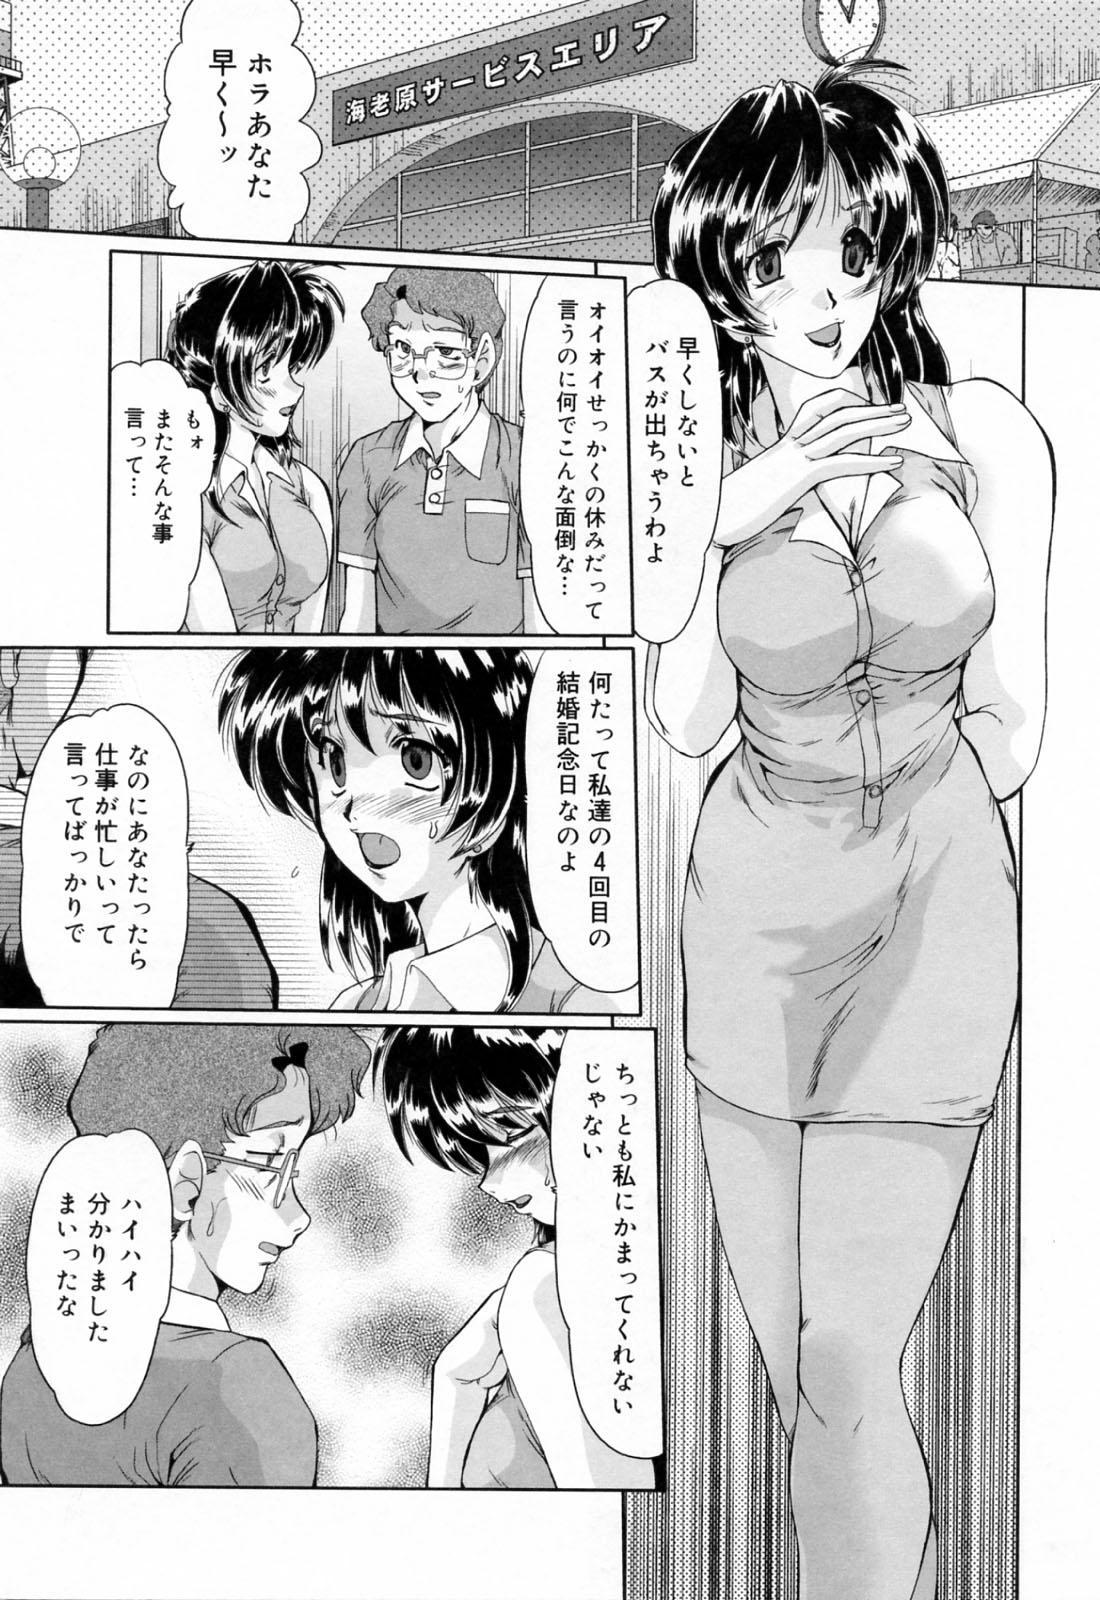 Kanjuku Hitozuma Nikki - The diary of the mature married woman 102